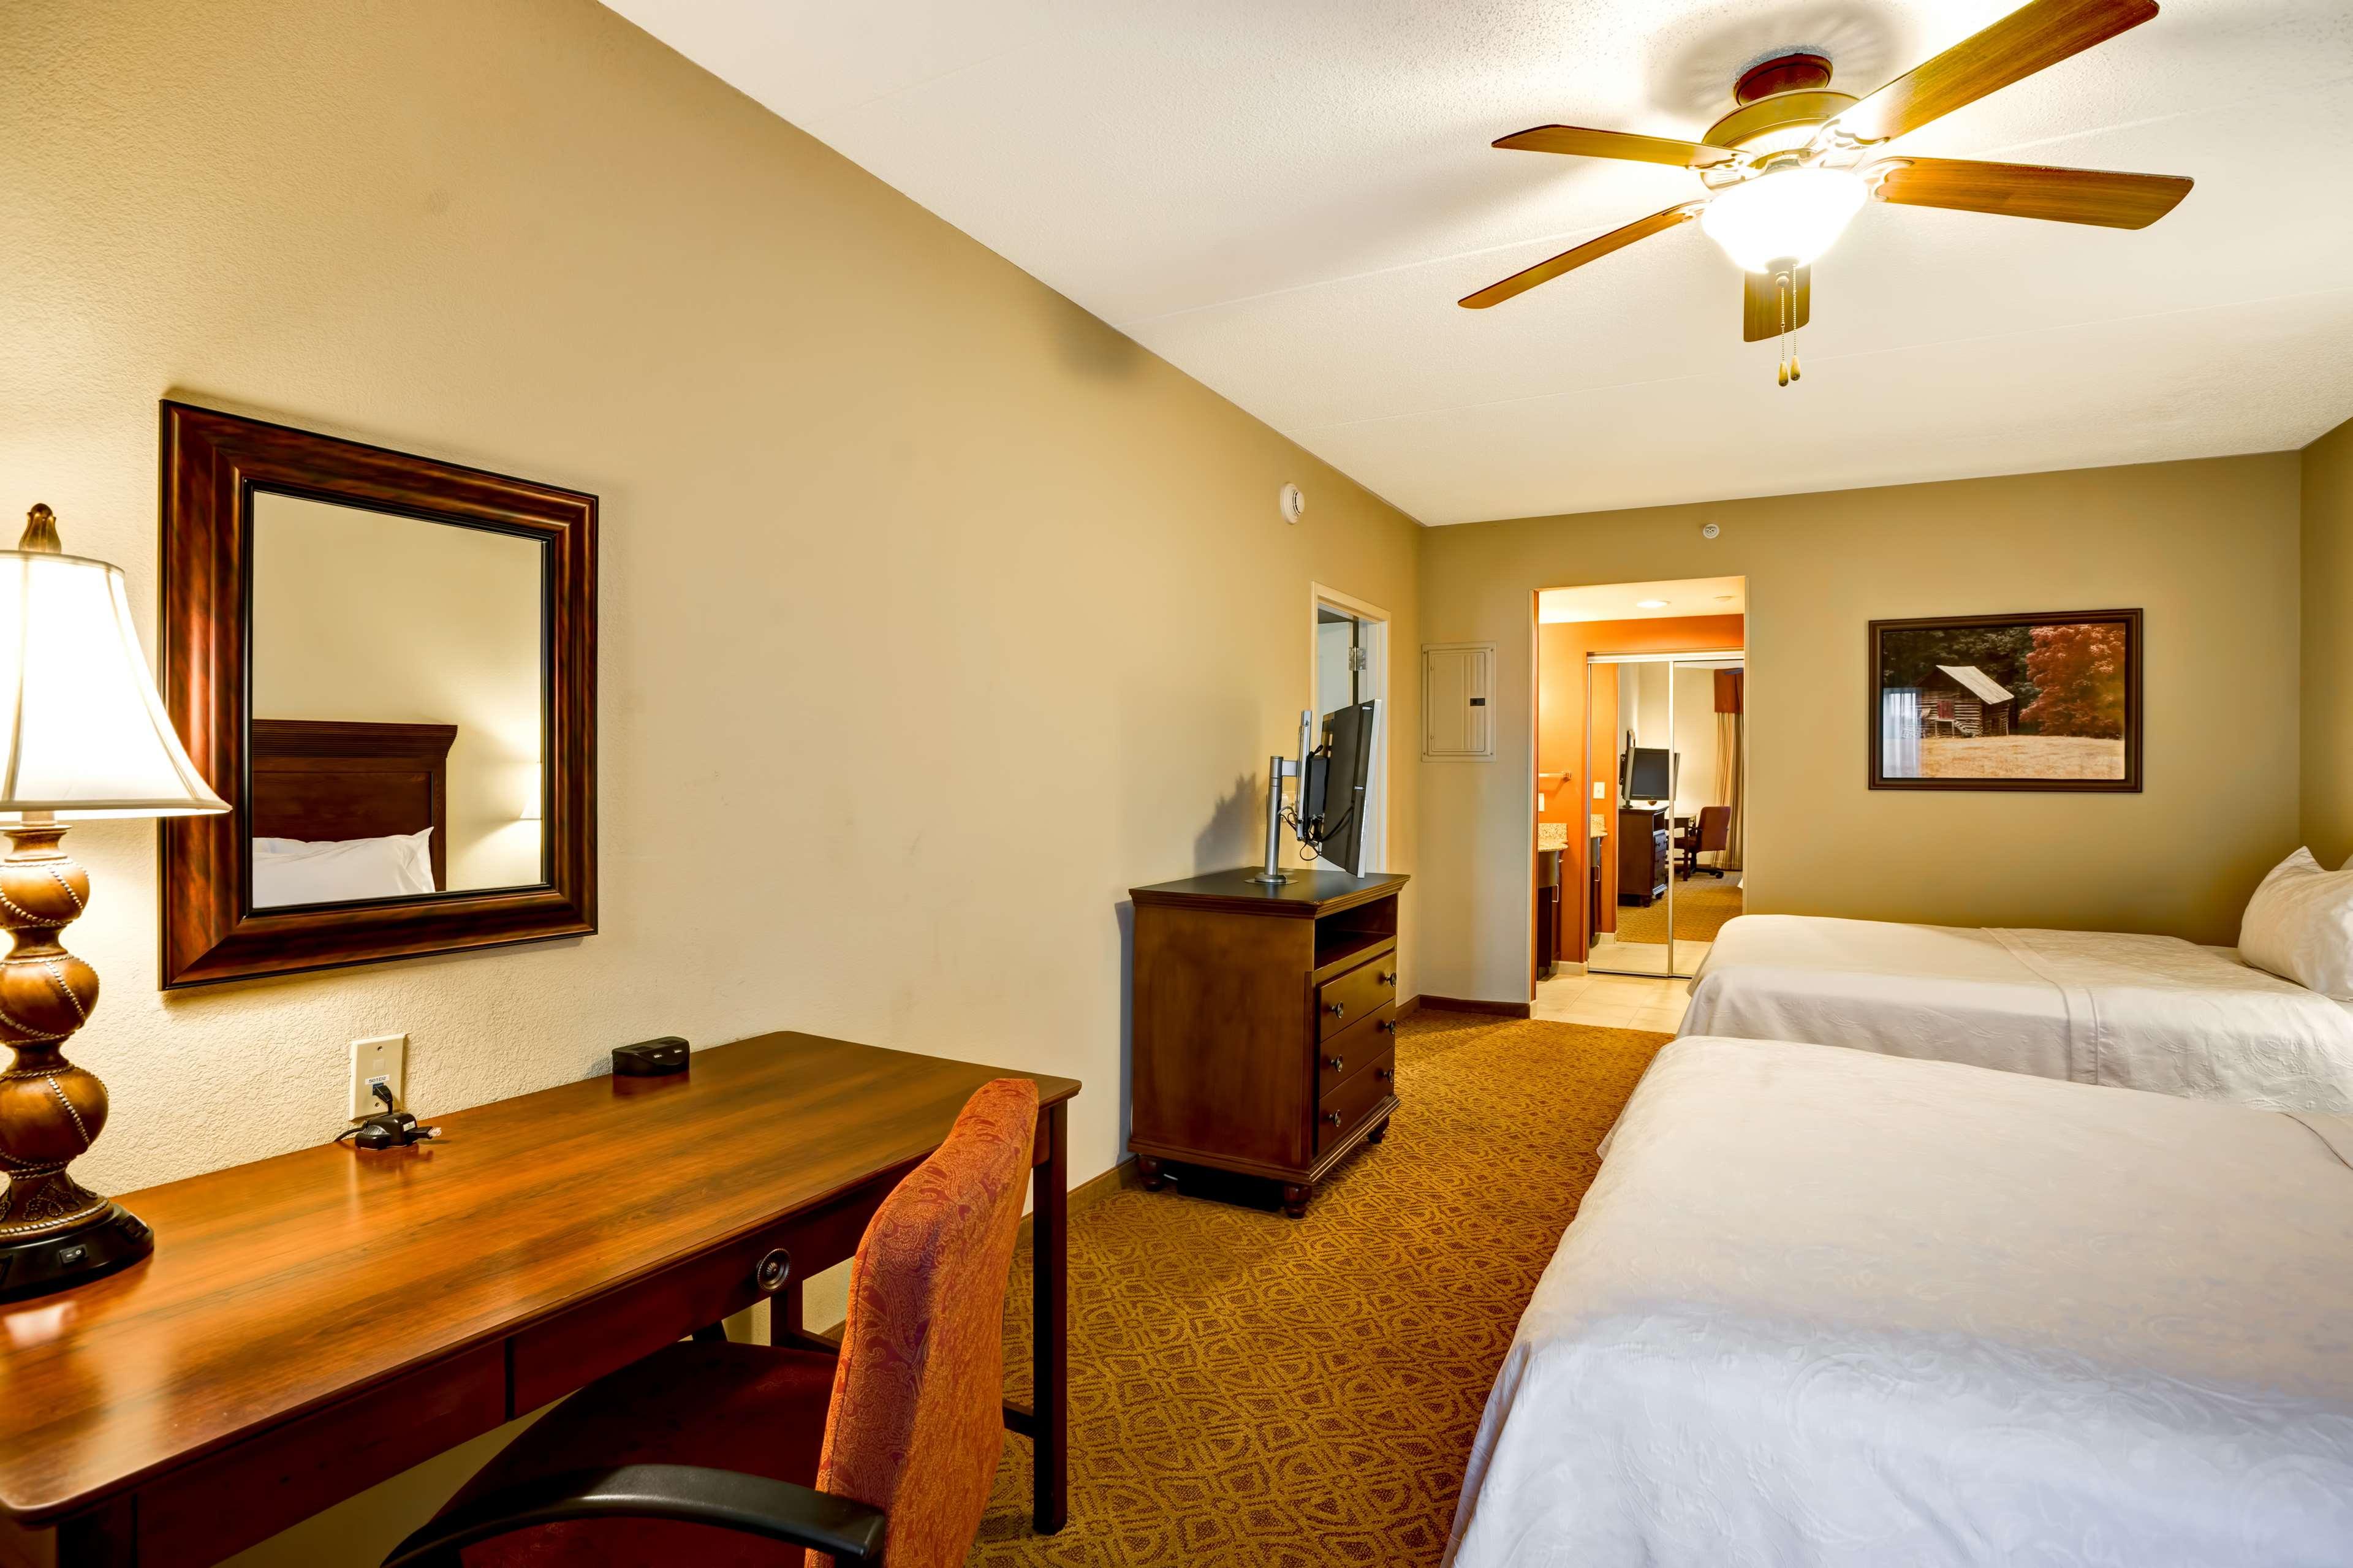 Homewood Suites by Hilton Fredericksburg image 36